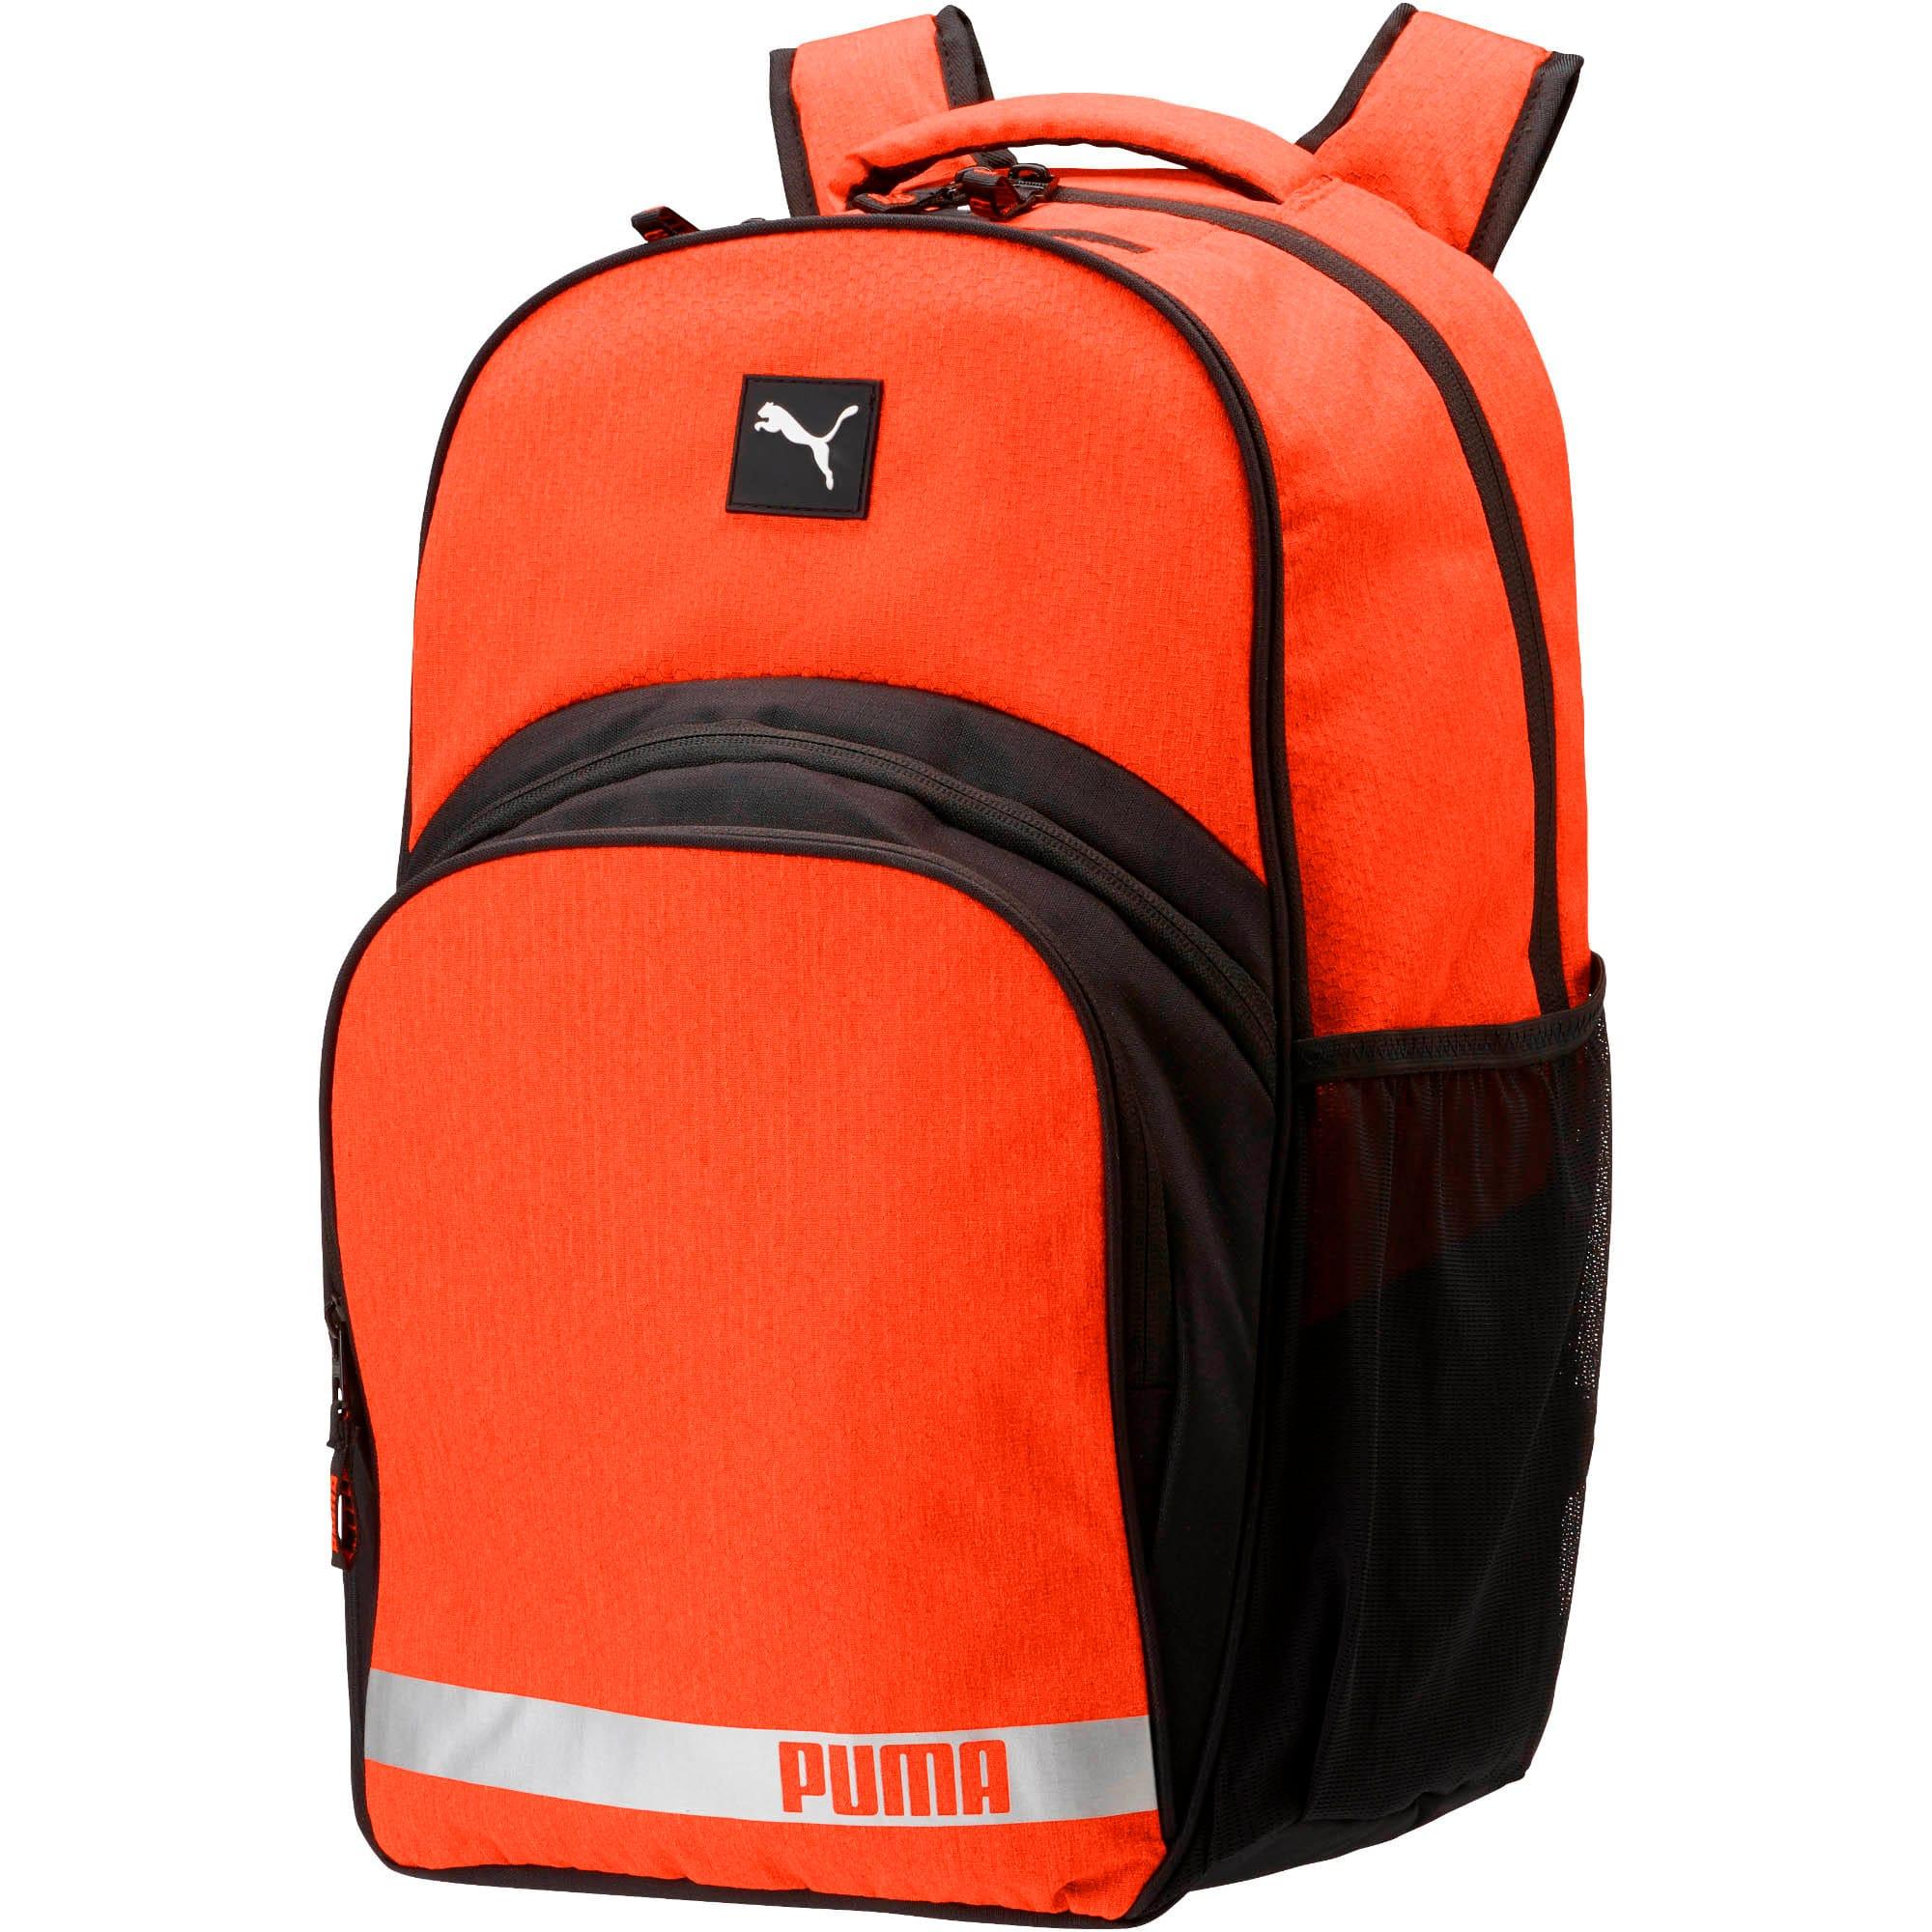 Thumbnail 1 of Formation 2.0 Ball Backpack, Orange, medium